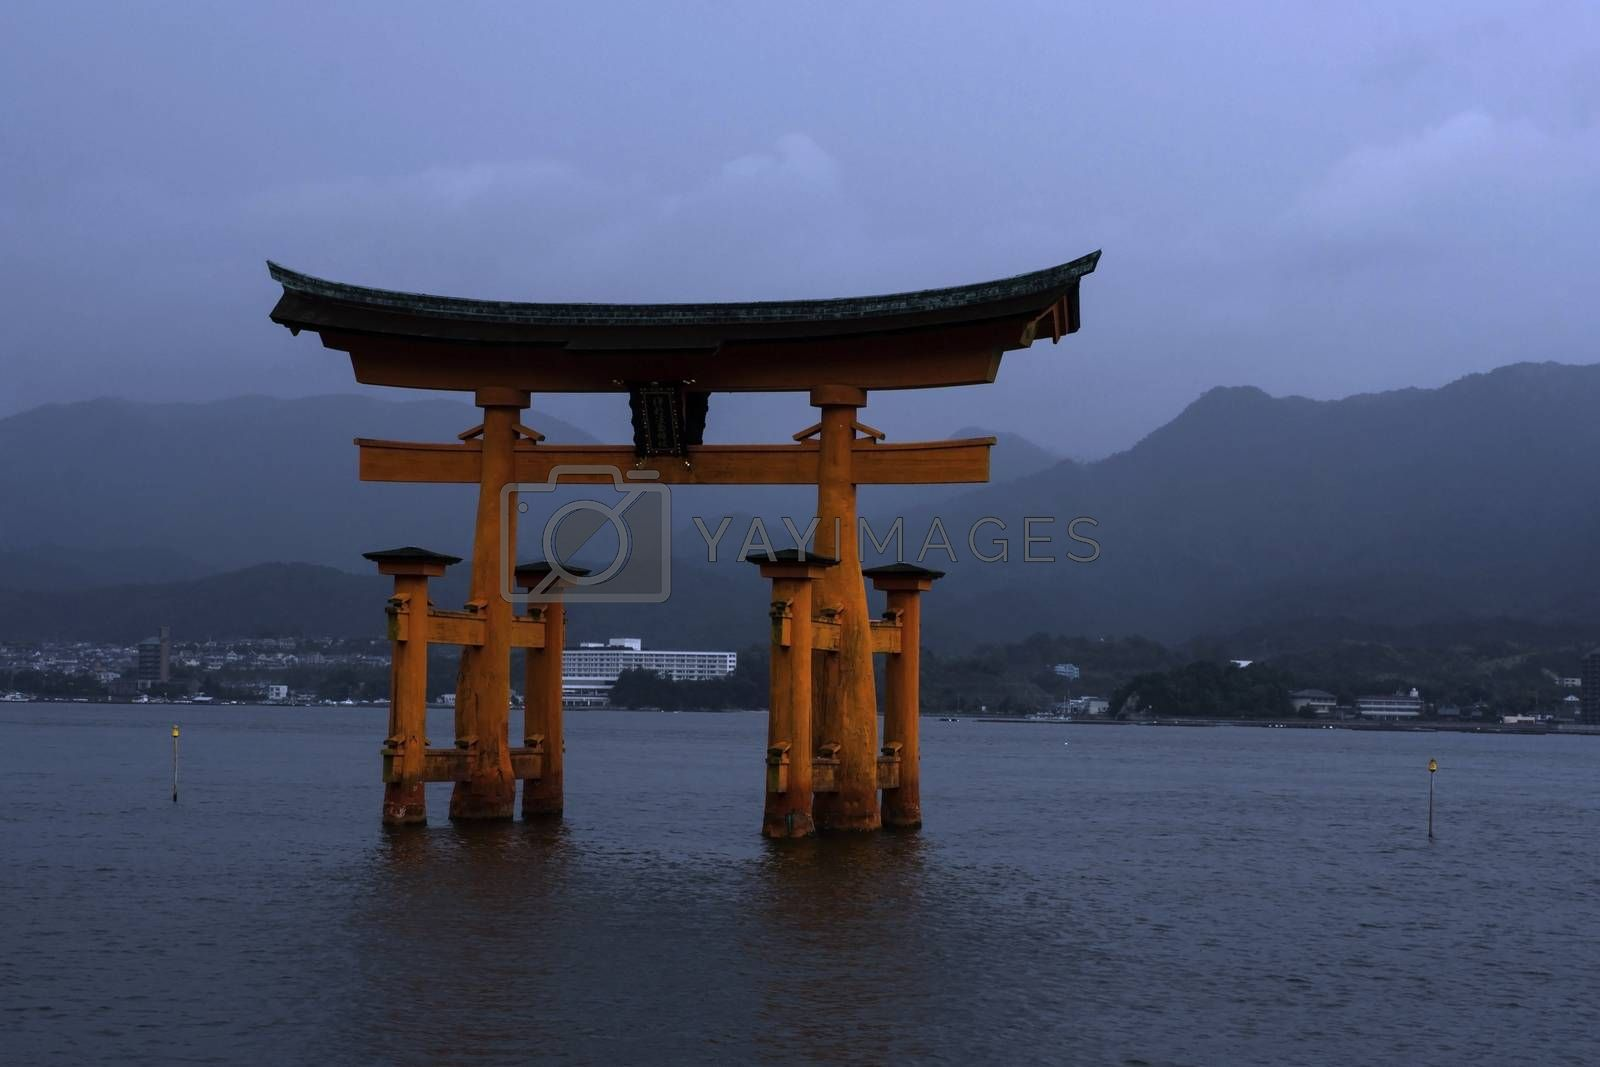 Royalty free image of Torii gate in Miyajima, Japan by photosil